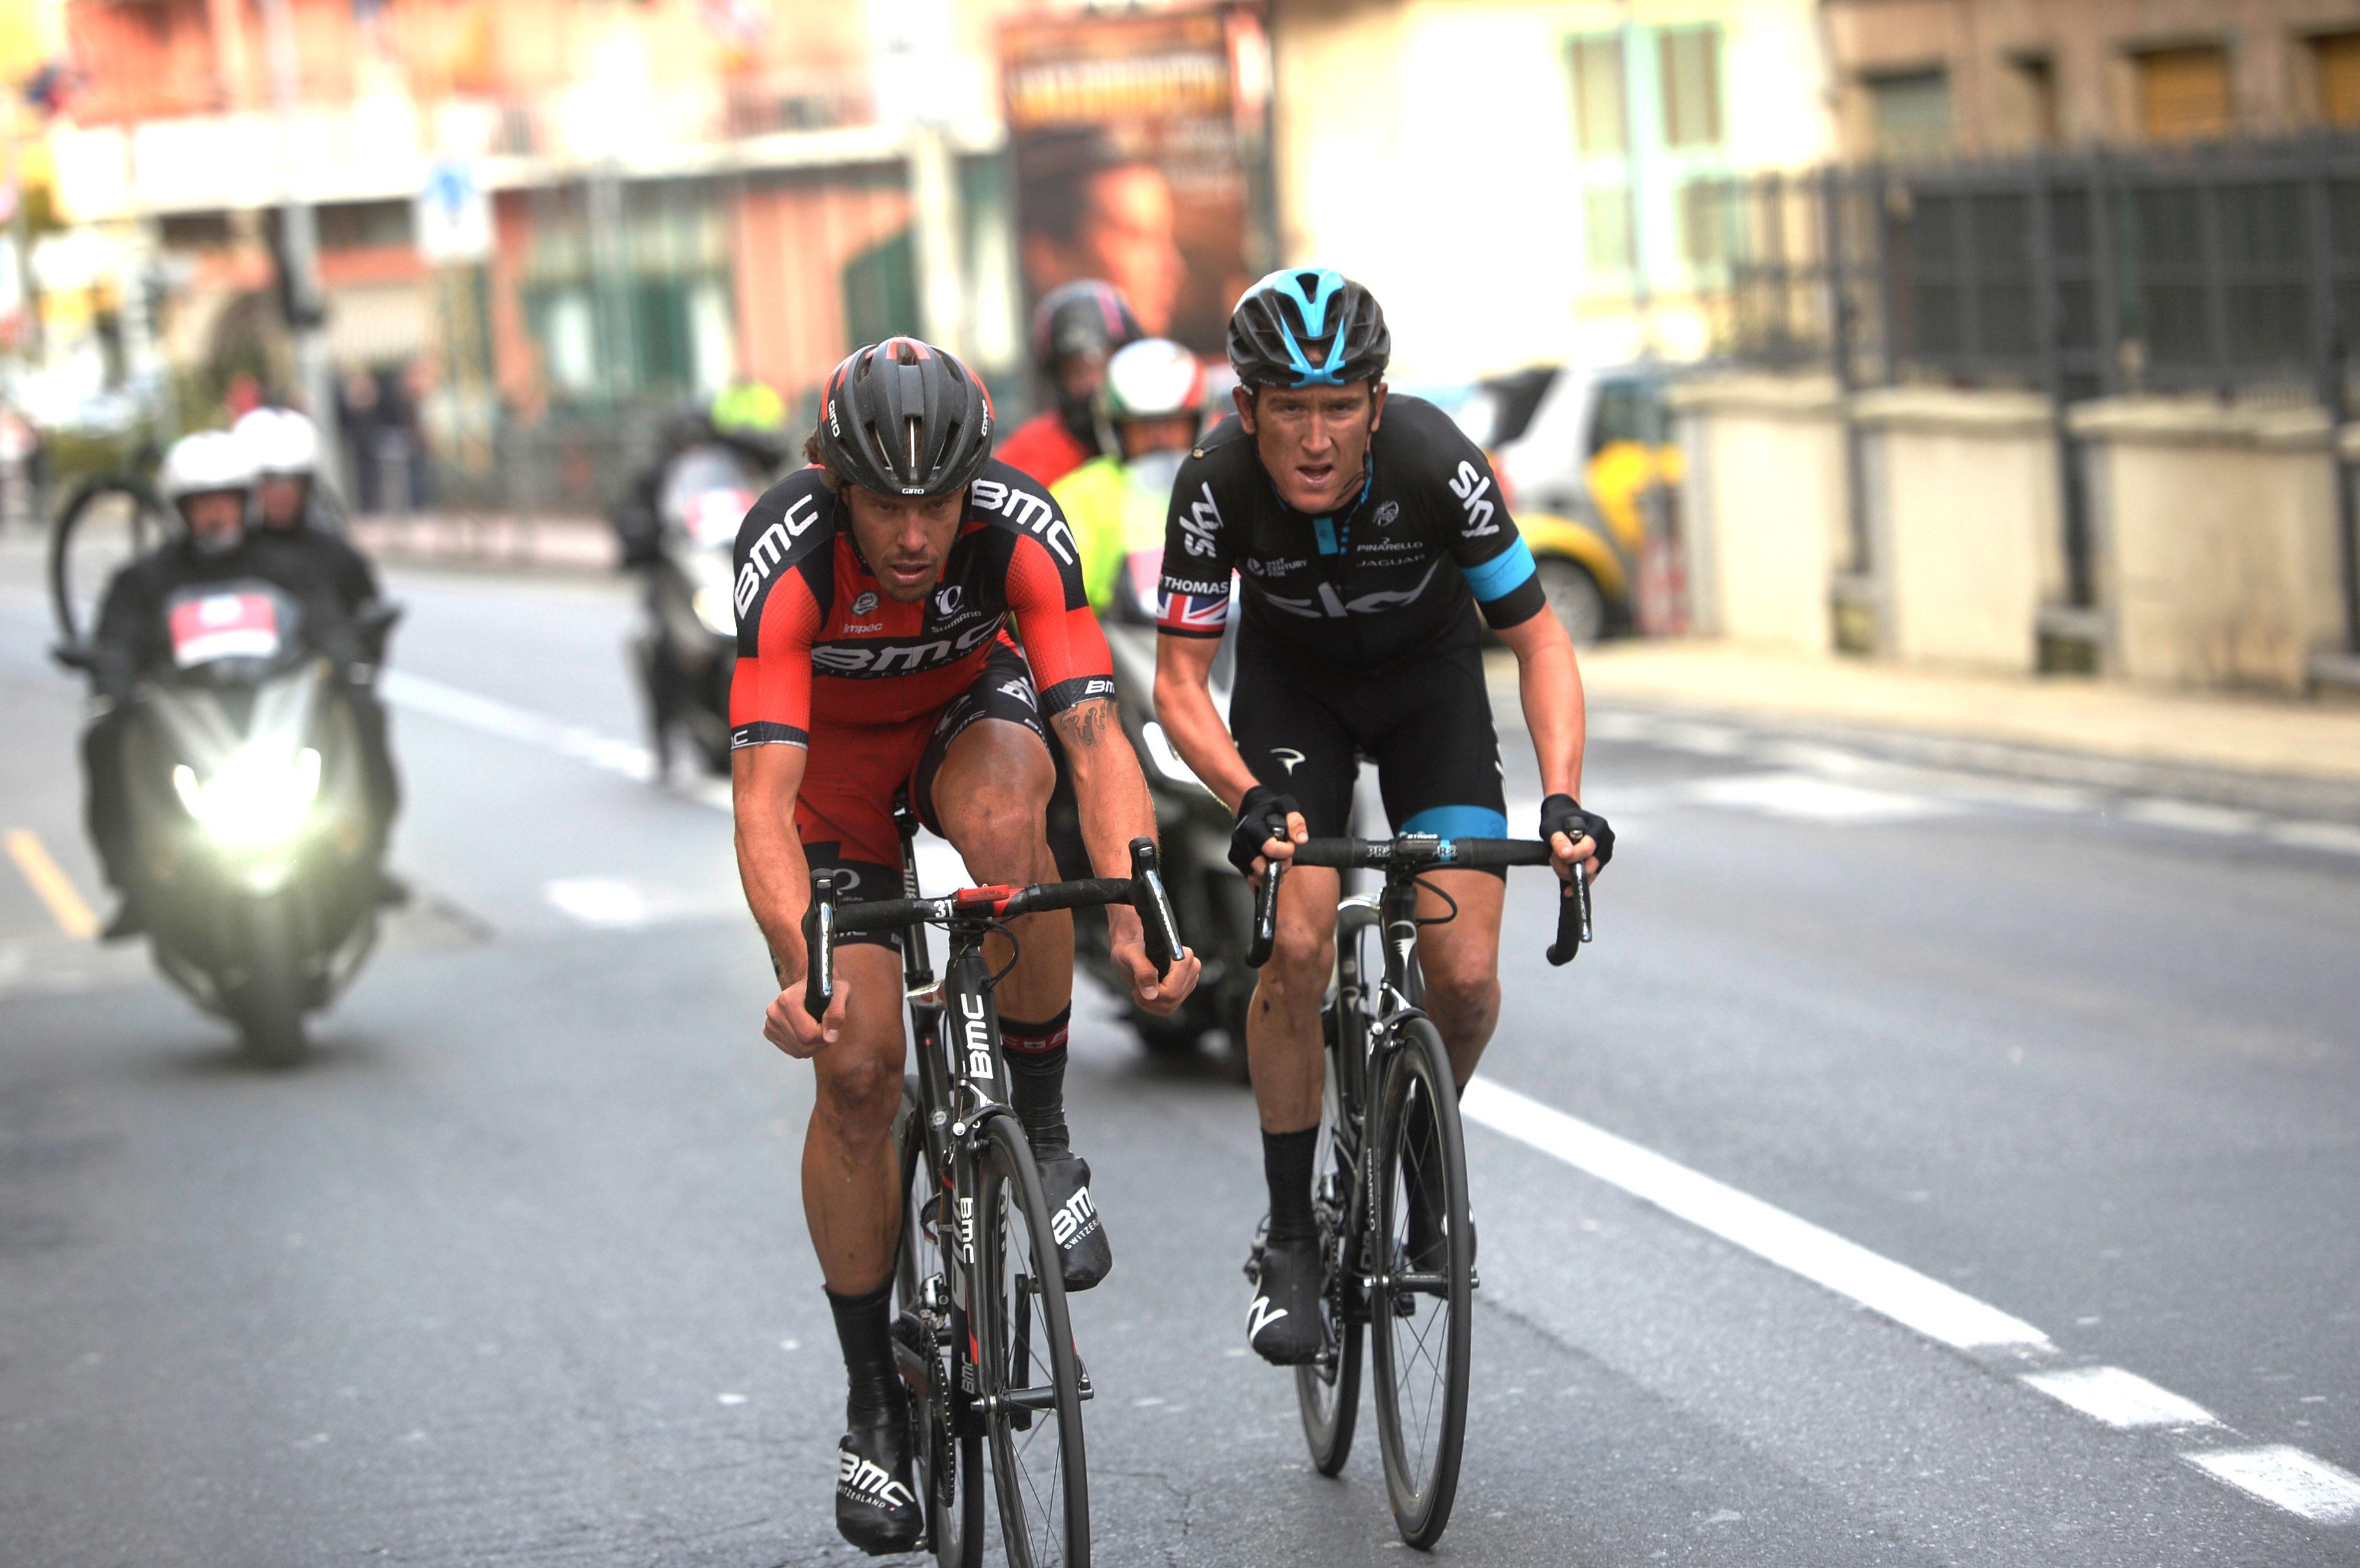 Geraint Thomas, Daniel Oss, Team Sky, BMC Racing, break, Milan-San Remo, 2015, pic: Sirotti